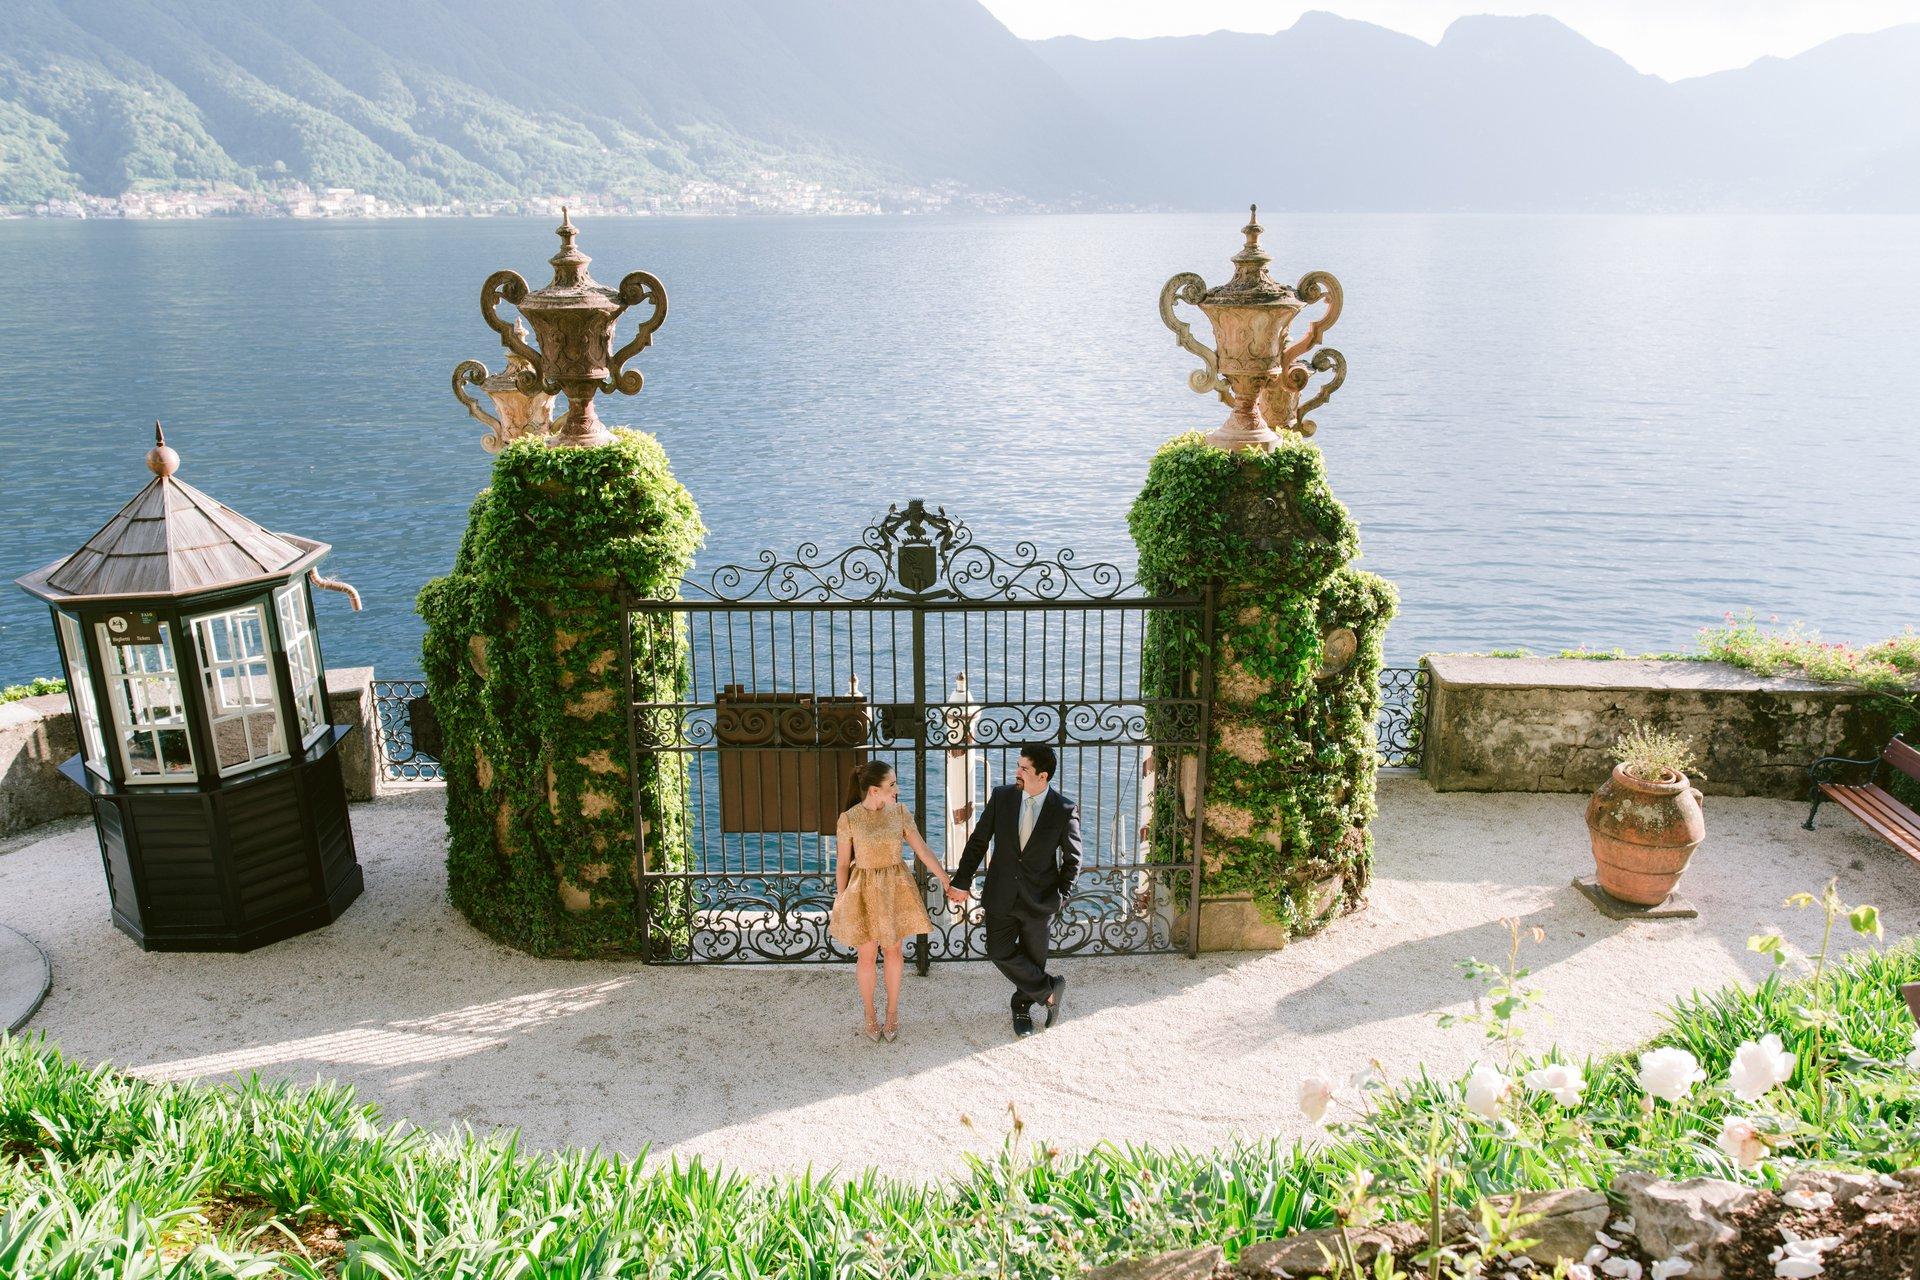 Lake Como-Italy-travel-story-Flytographer-118